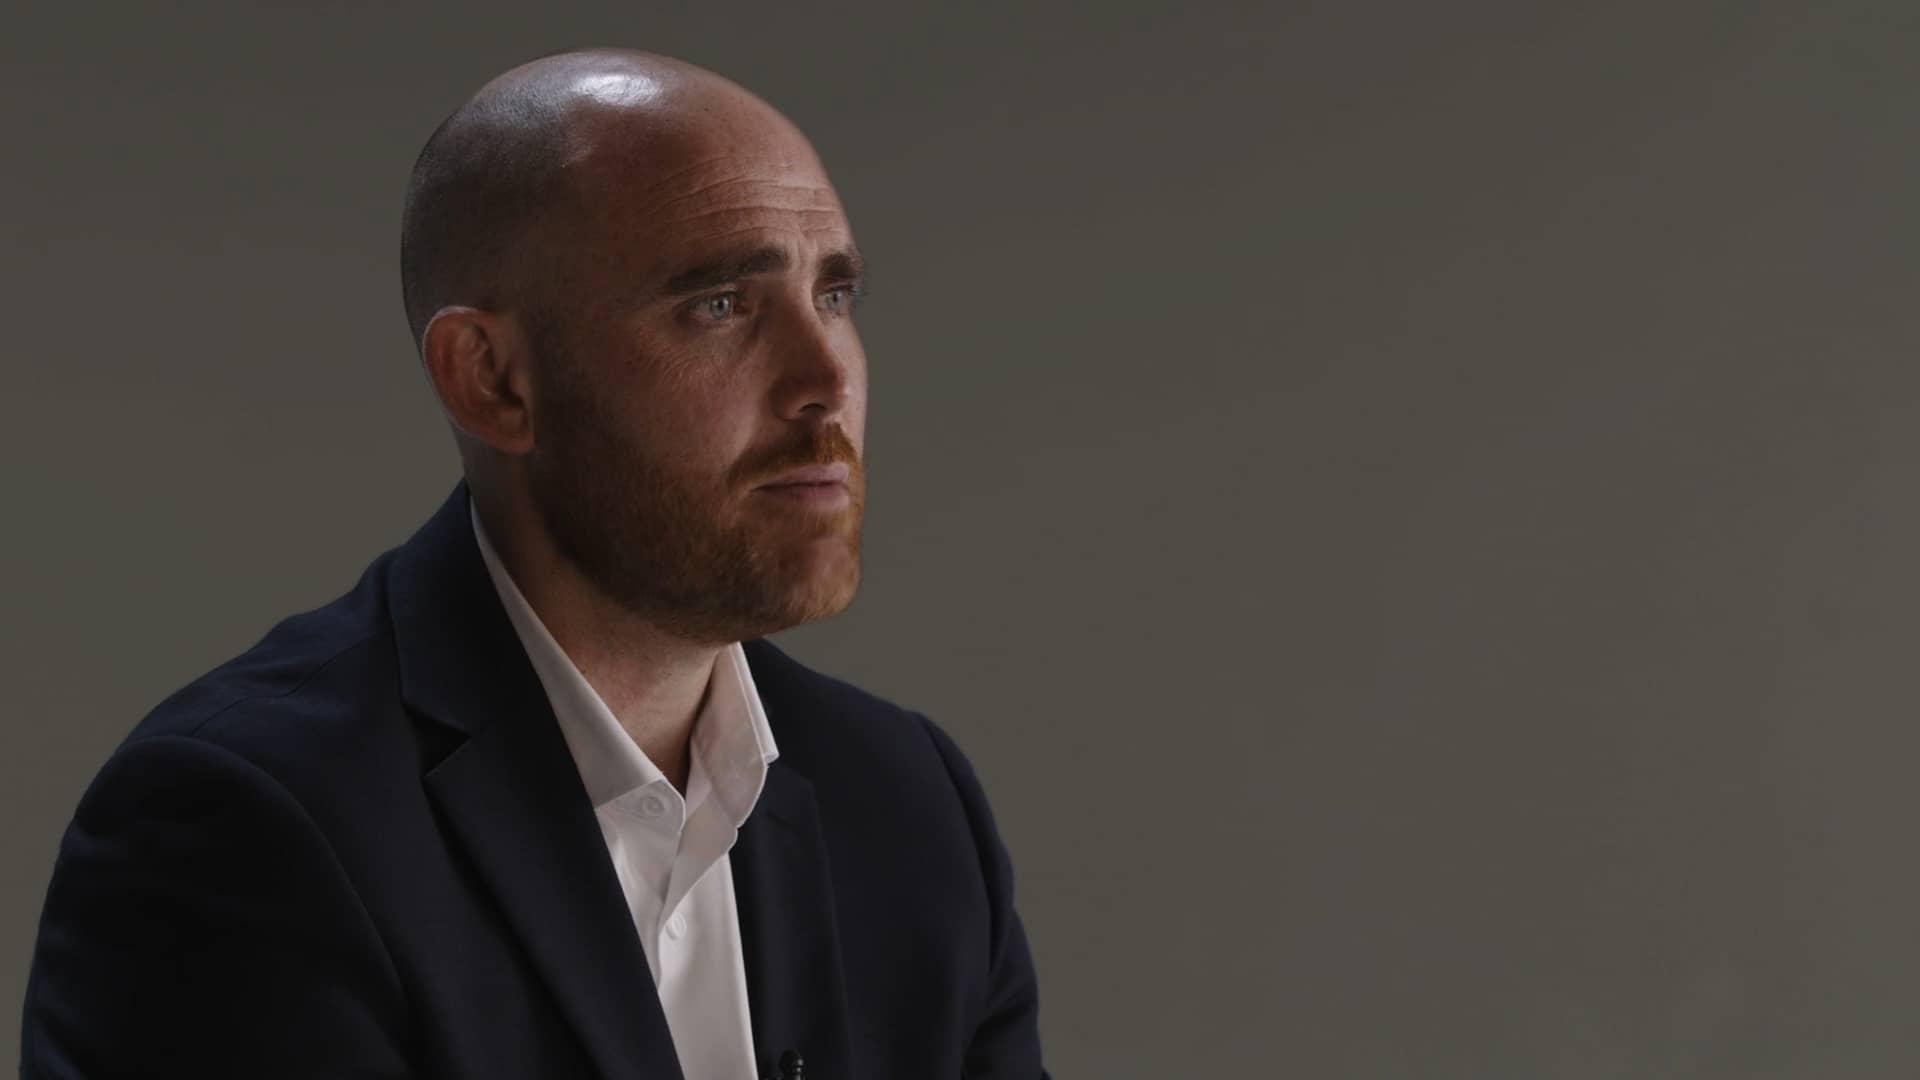 Oyster General Manager – Property, Steven Harris